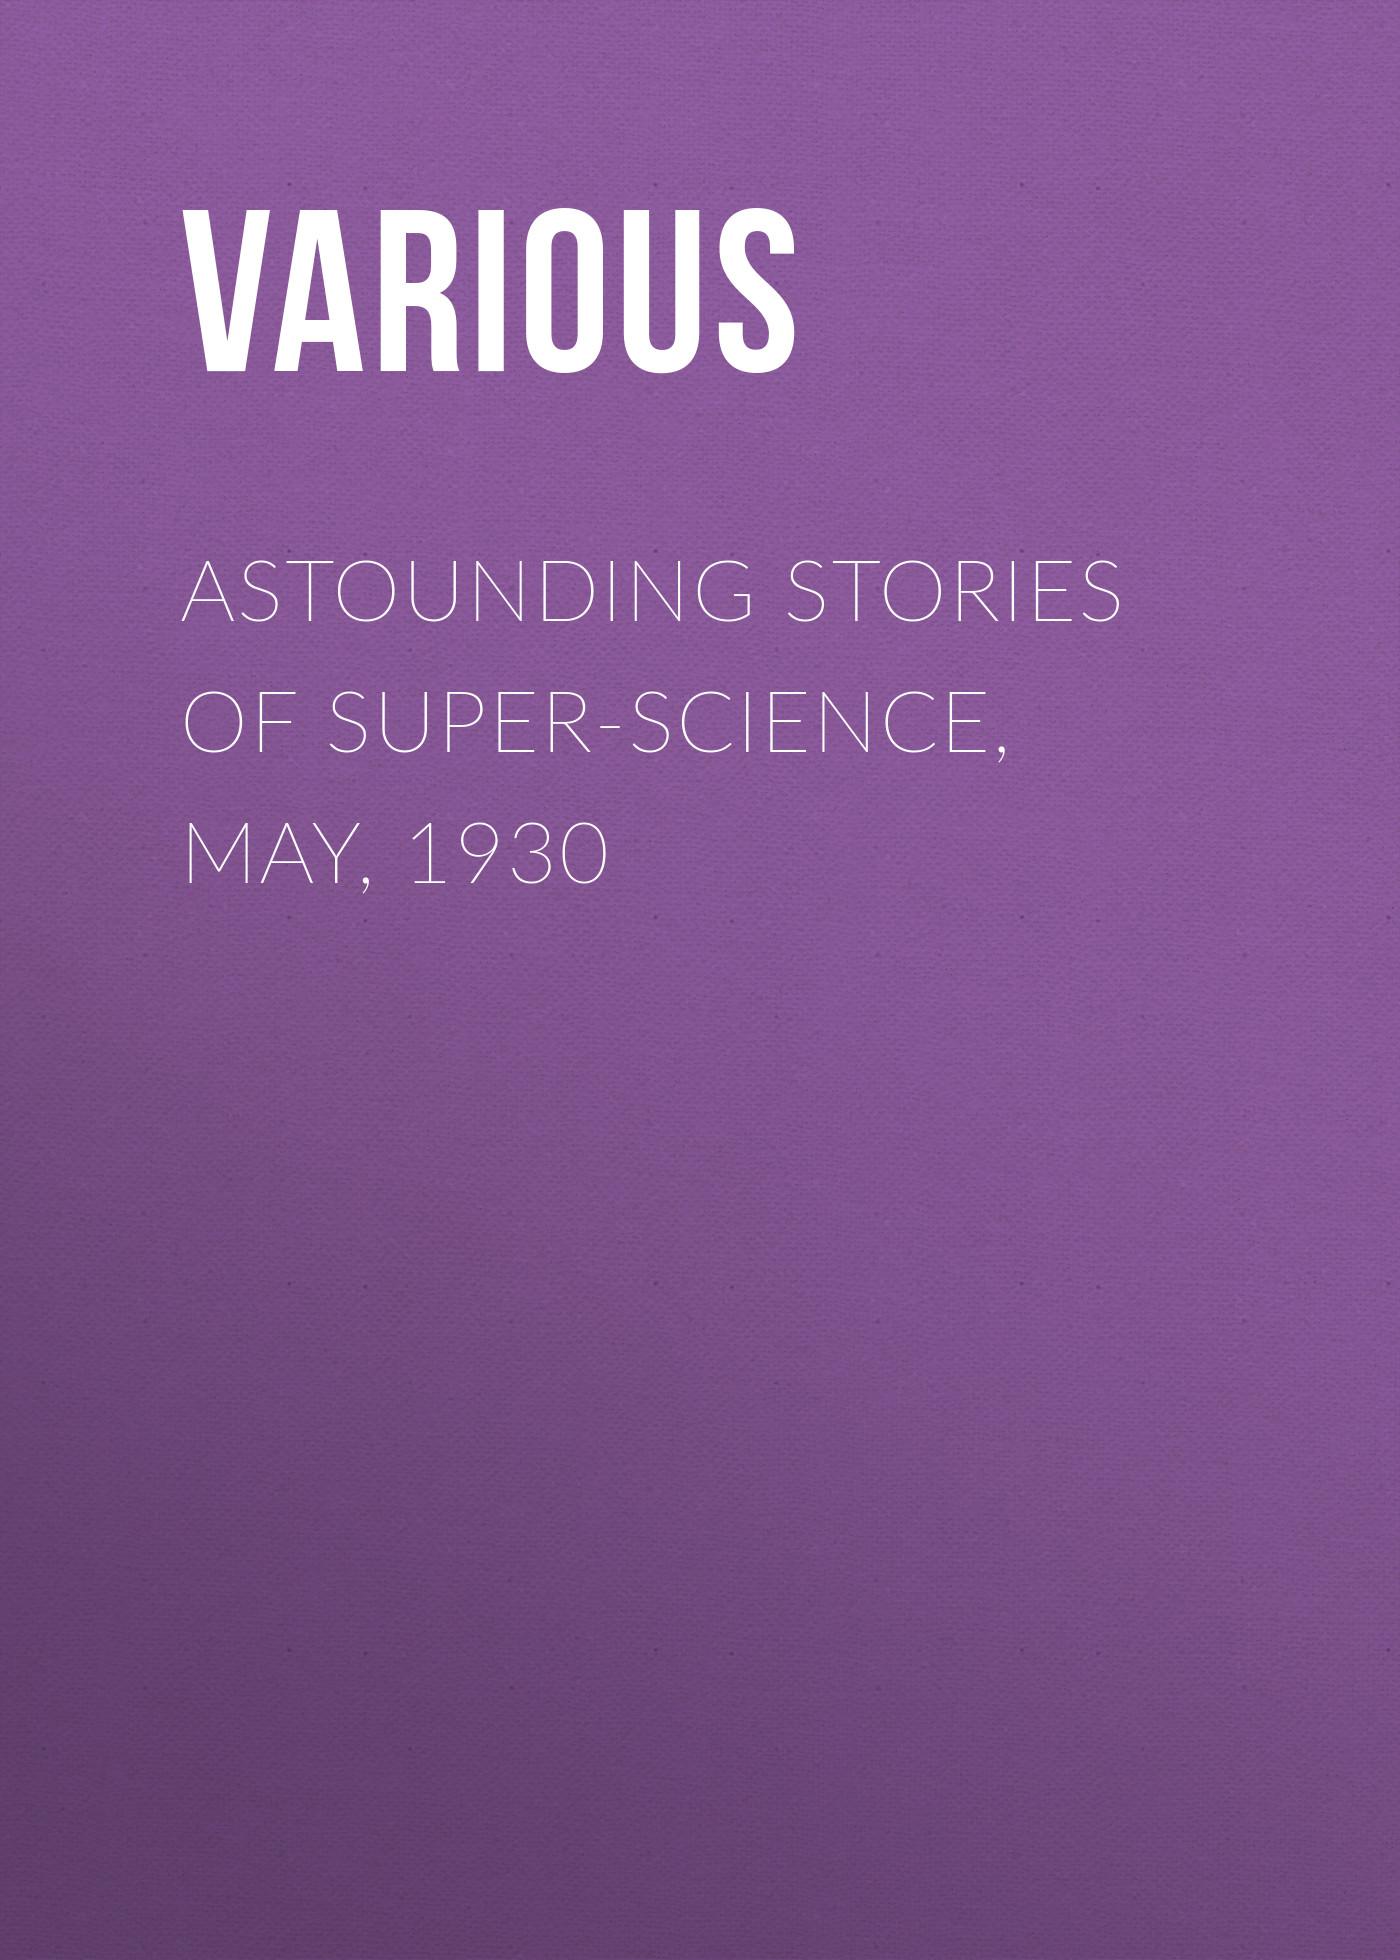 Various Astounding Stories of Super-Science, May, 1930 vitaly mushkin erotic stories top ten